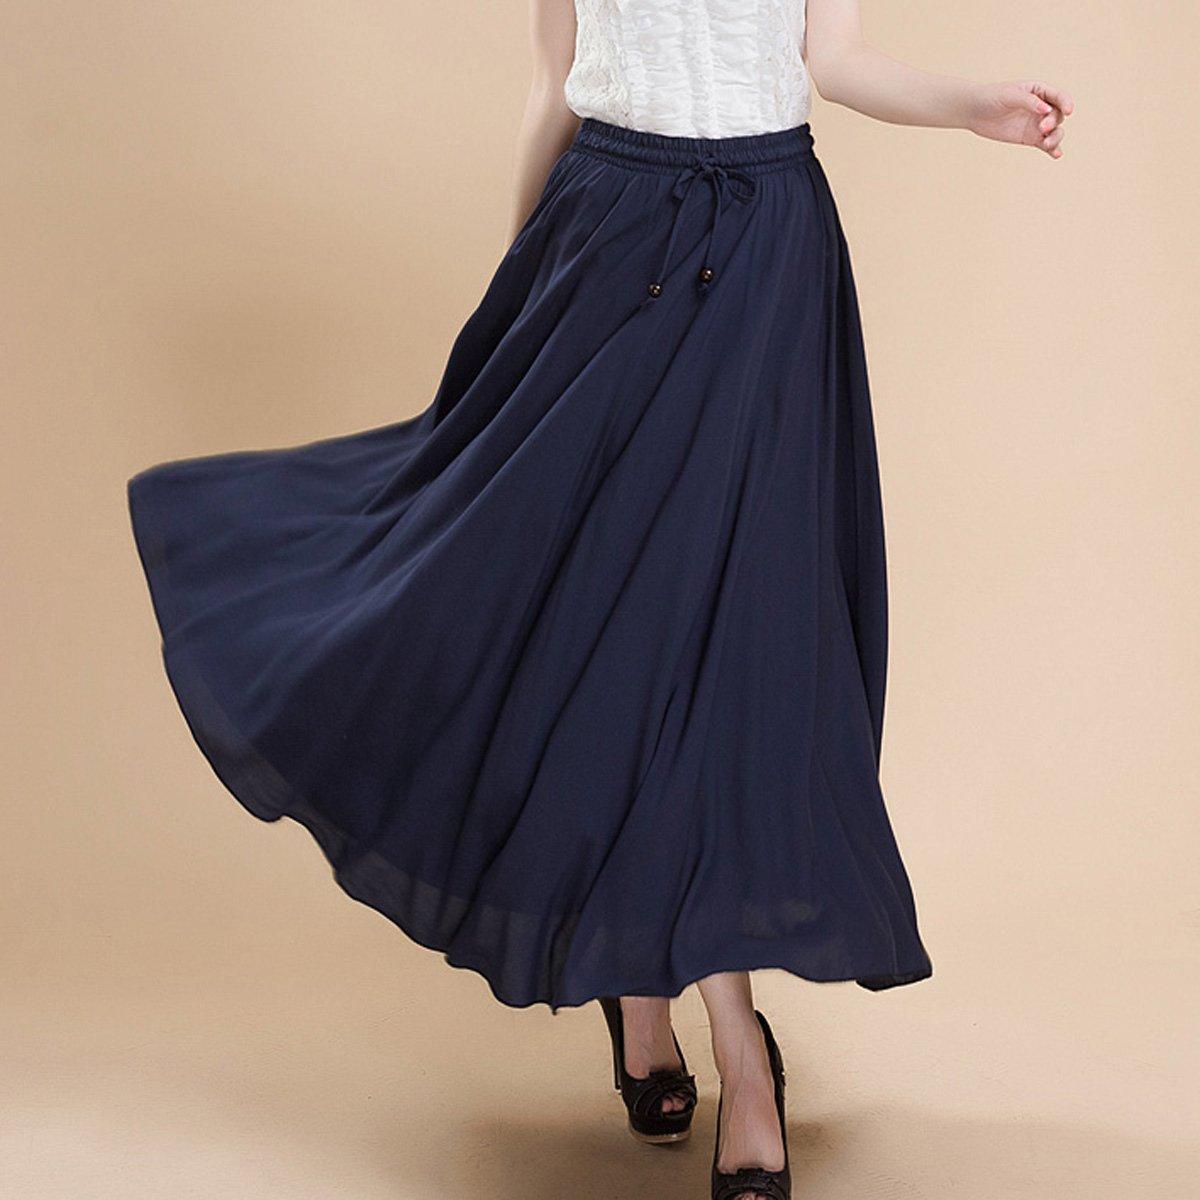 3902998f3 Feoya Falda Larga para Mujeres Plisada Maxi Dress Bohemia para Playa ...